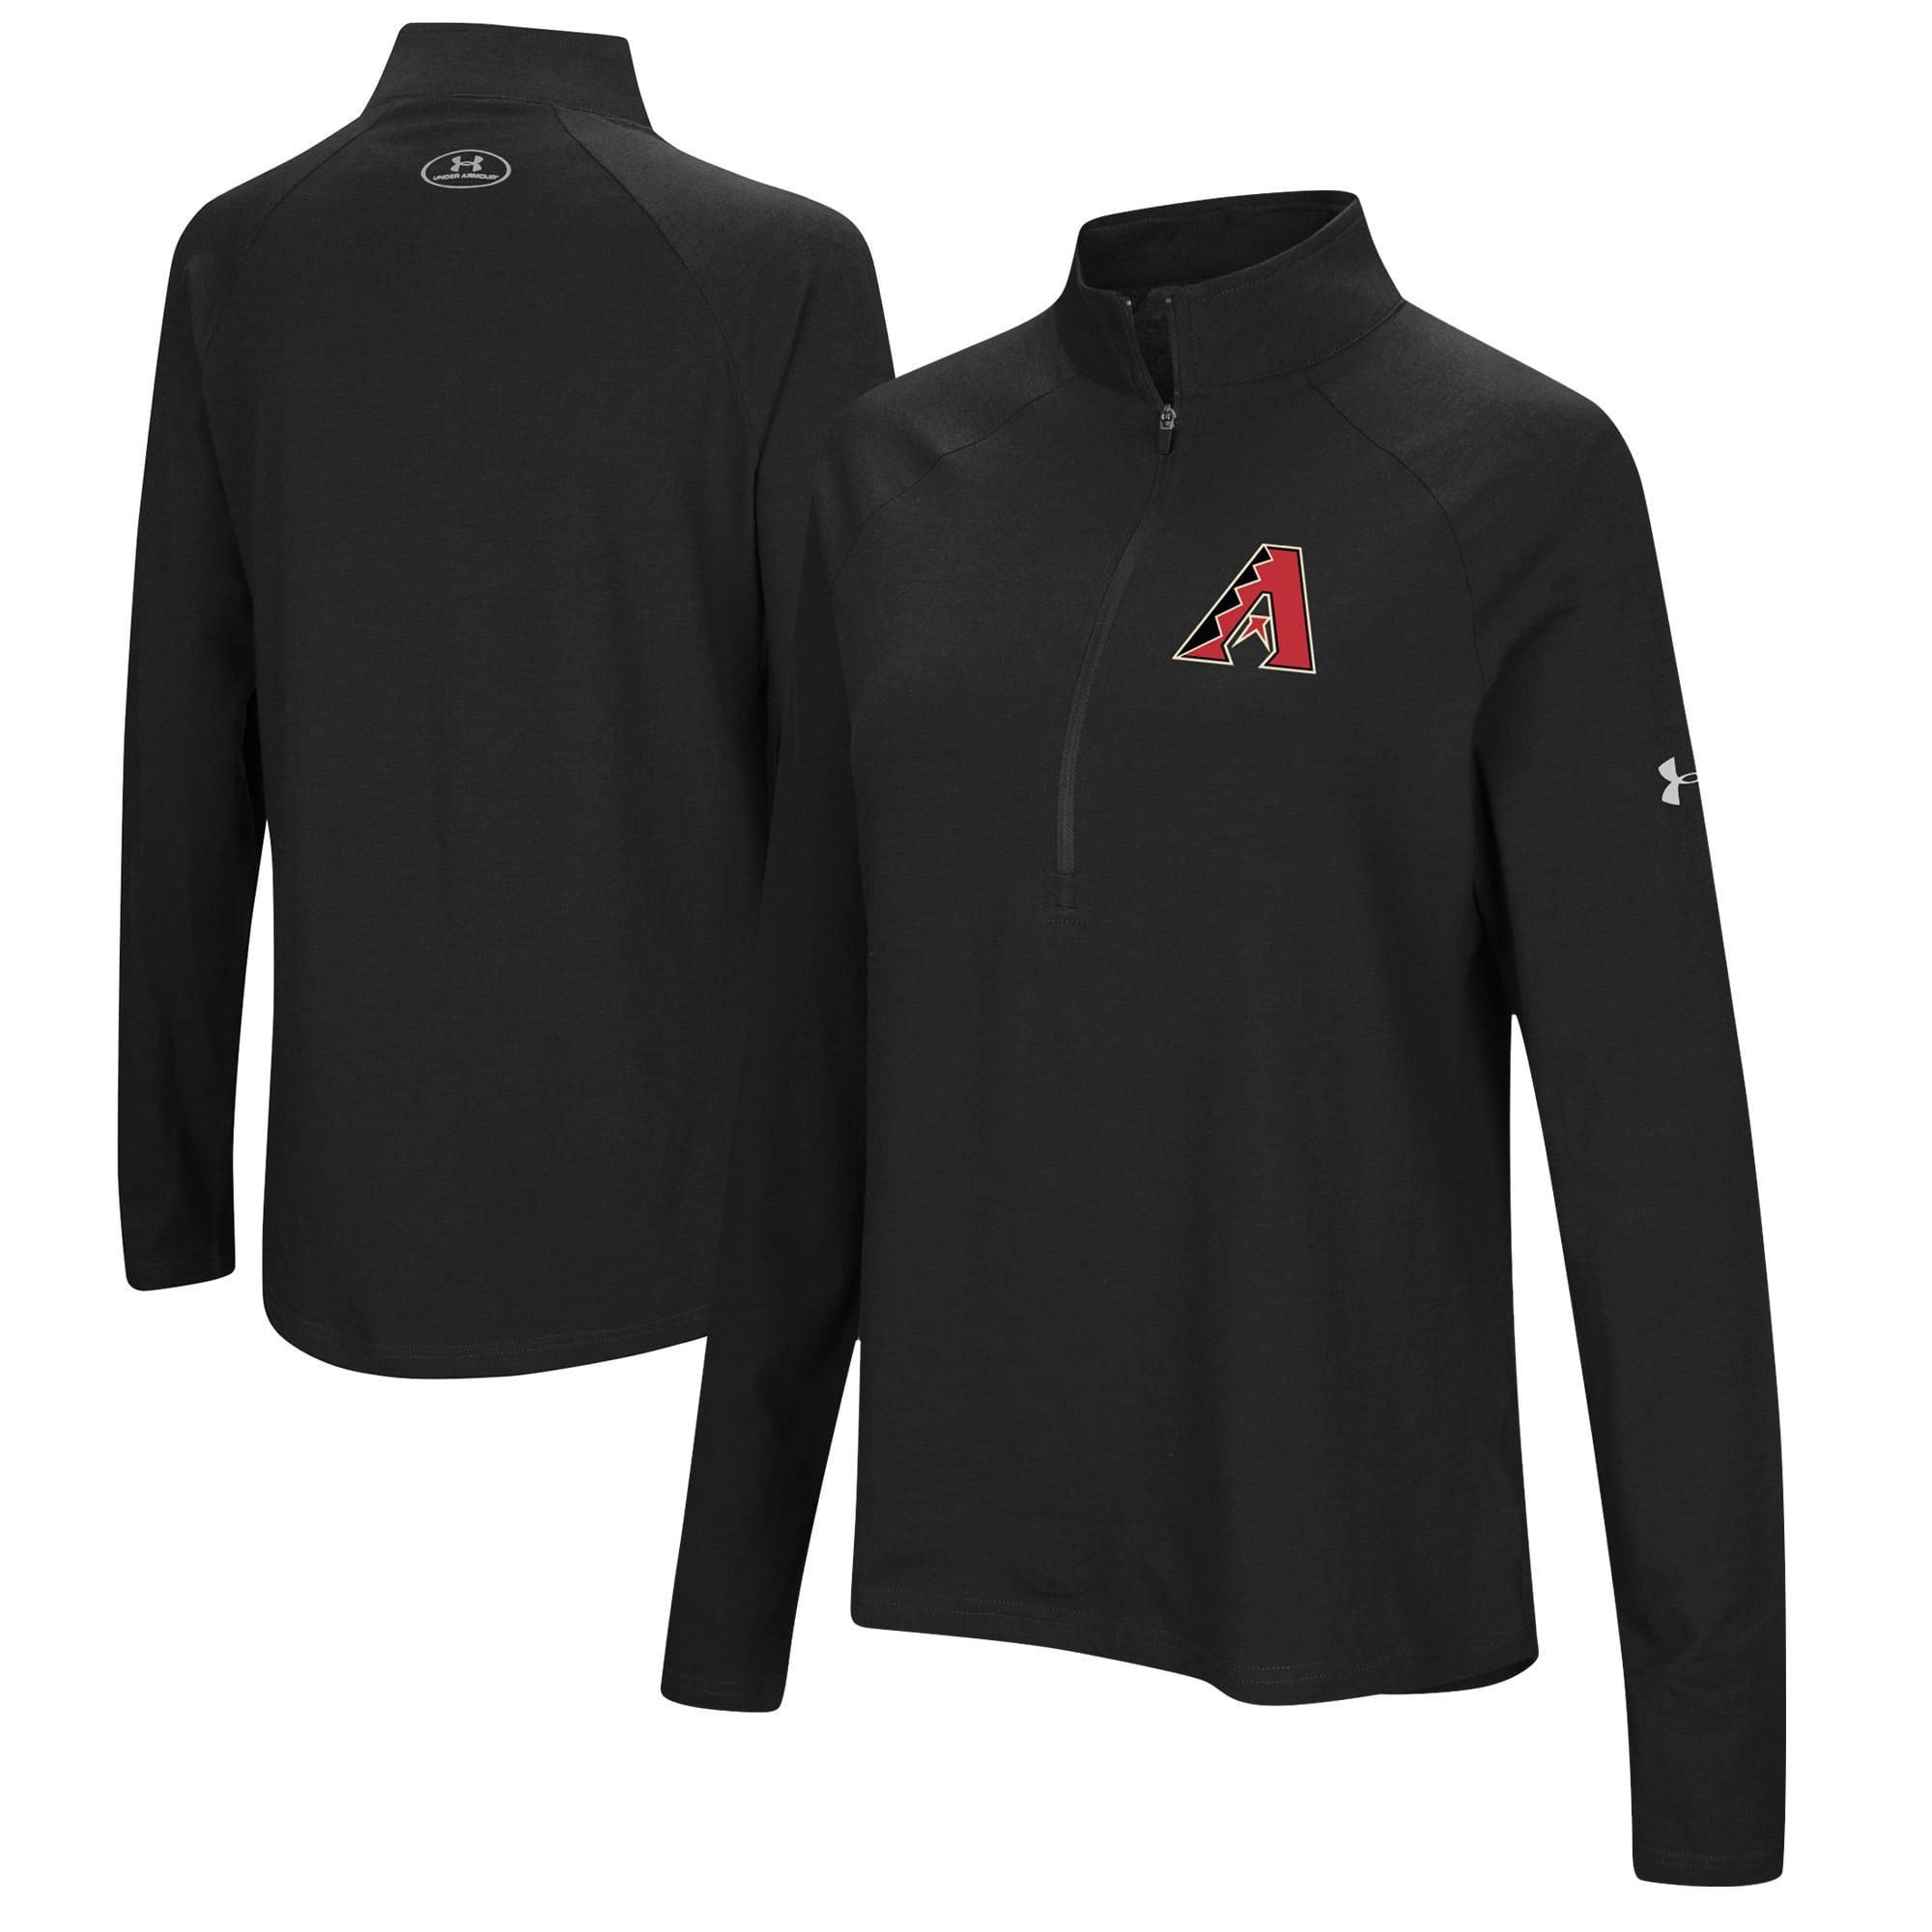 Arizona Diamondbacks Under Armour Women's Passion Performance Tri-Blend Raglan Half-Zip Pullover Jacket - Black